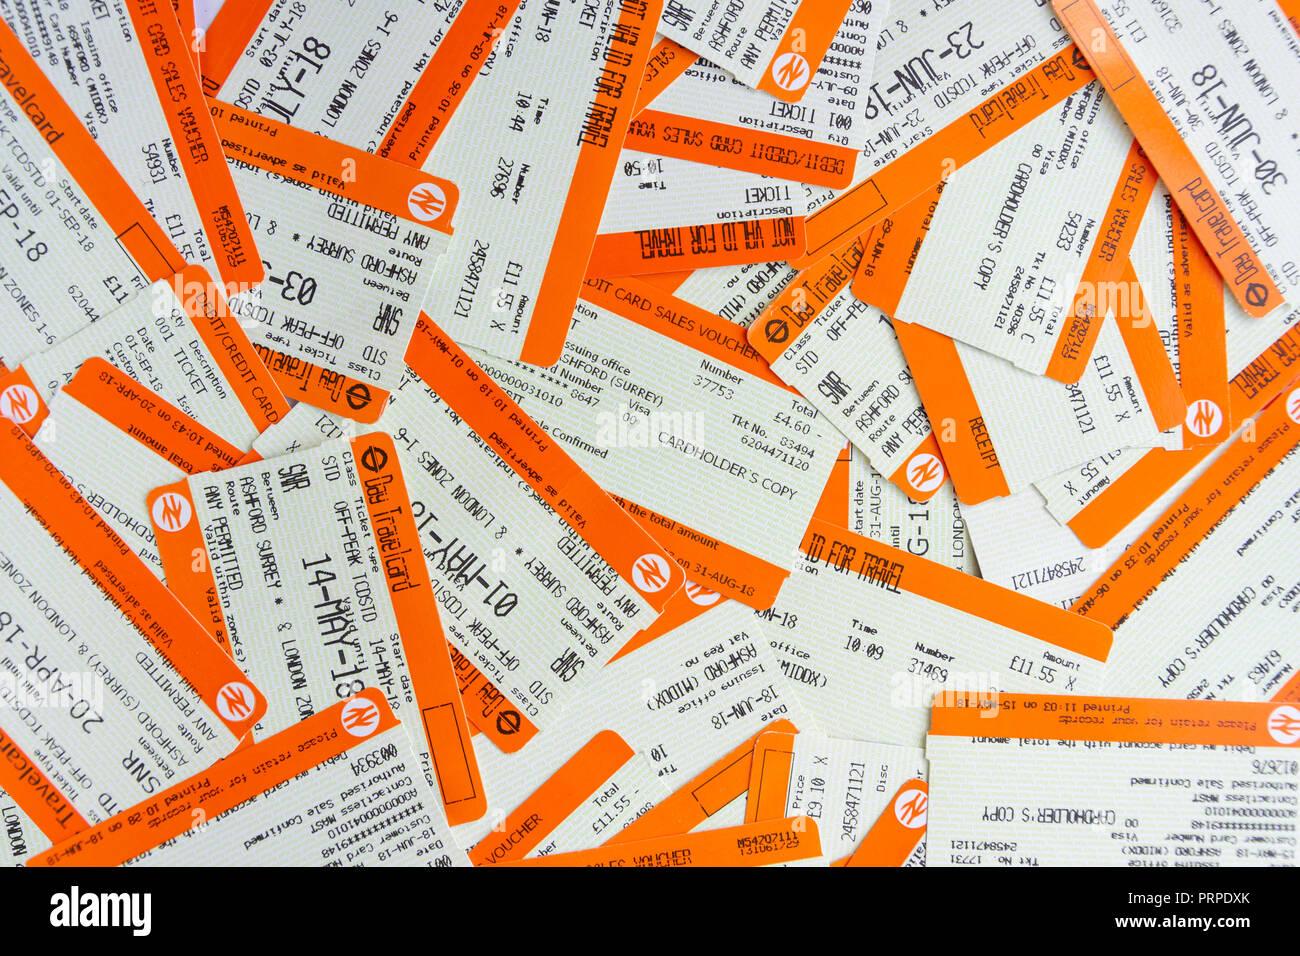 Still-life of Southern railway tickets, Ashford, Surrey, England, United Kingdom - Stock Image